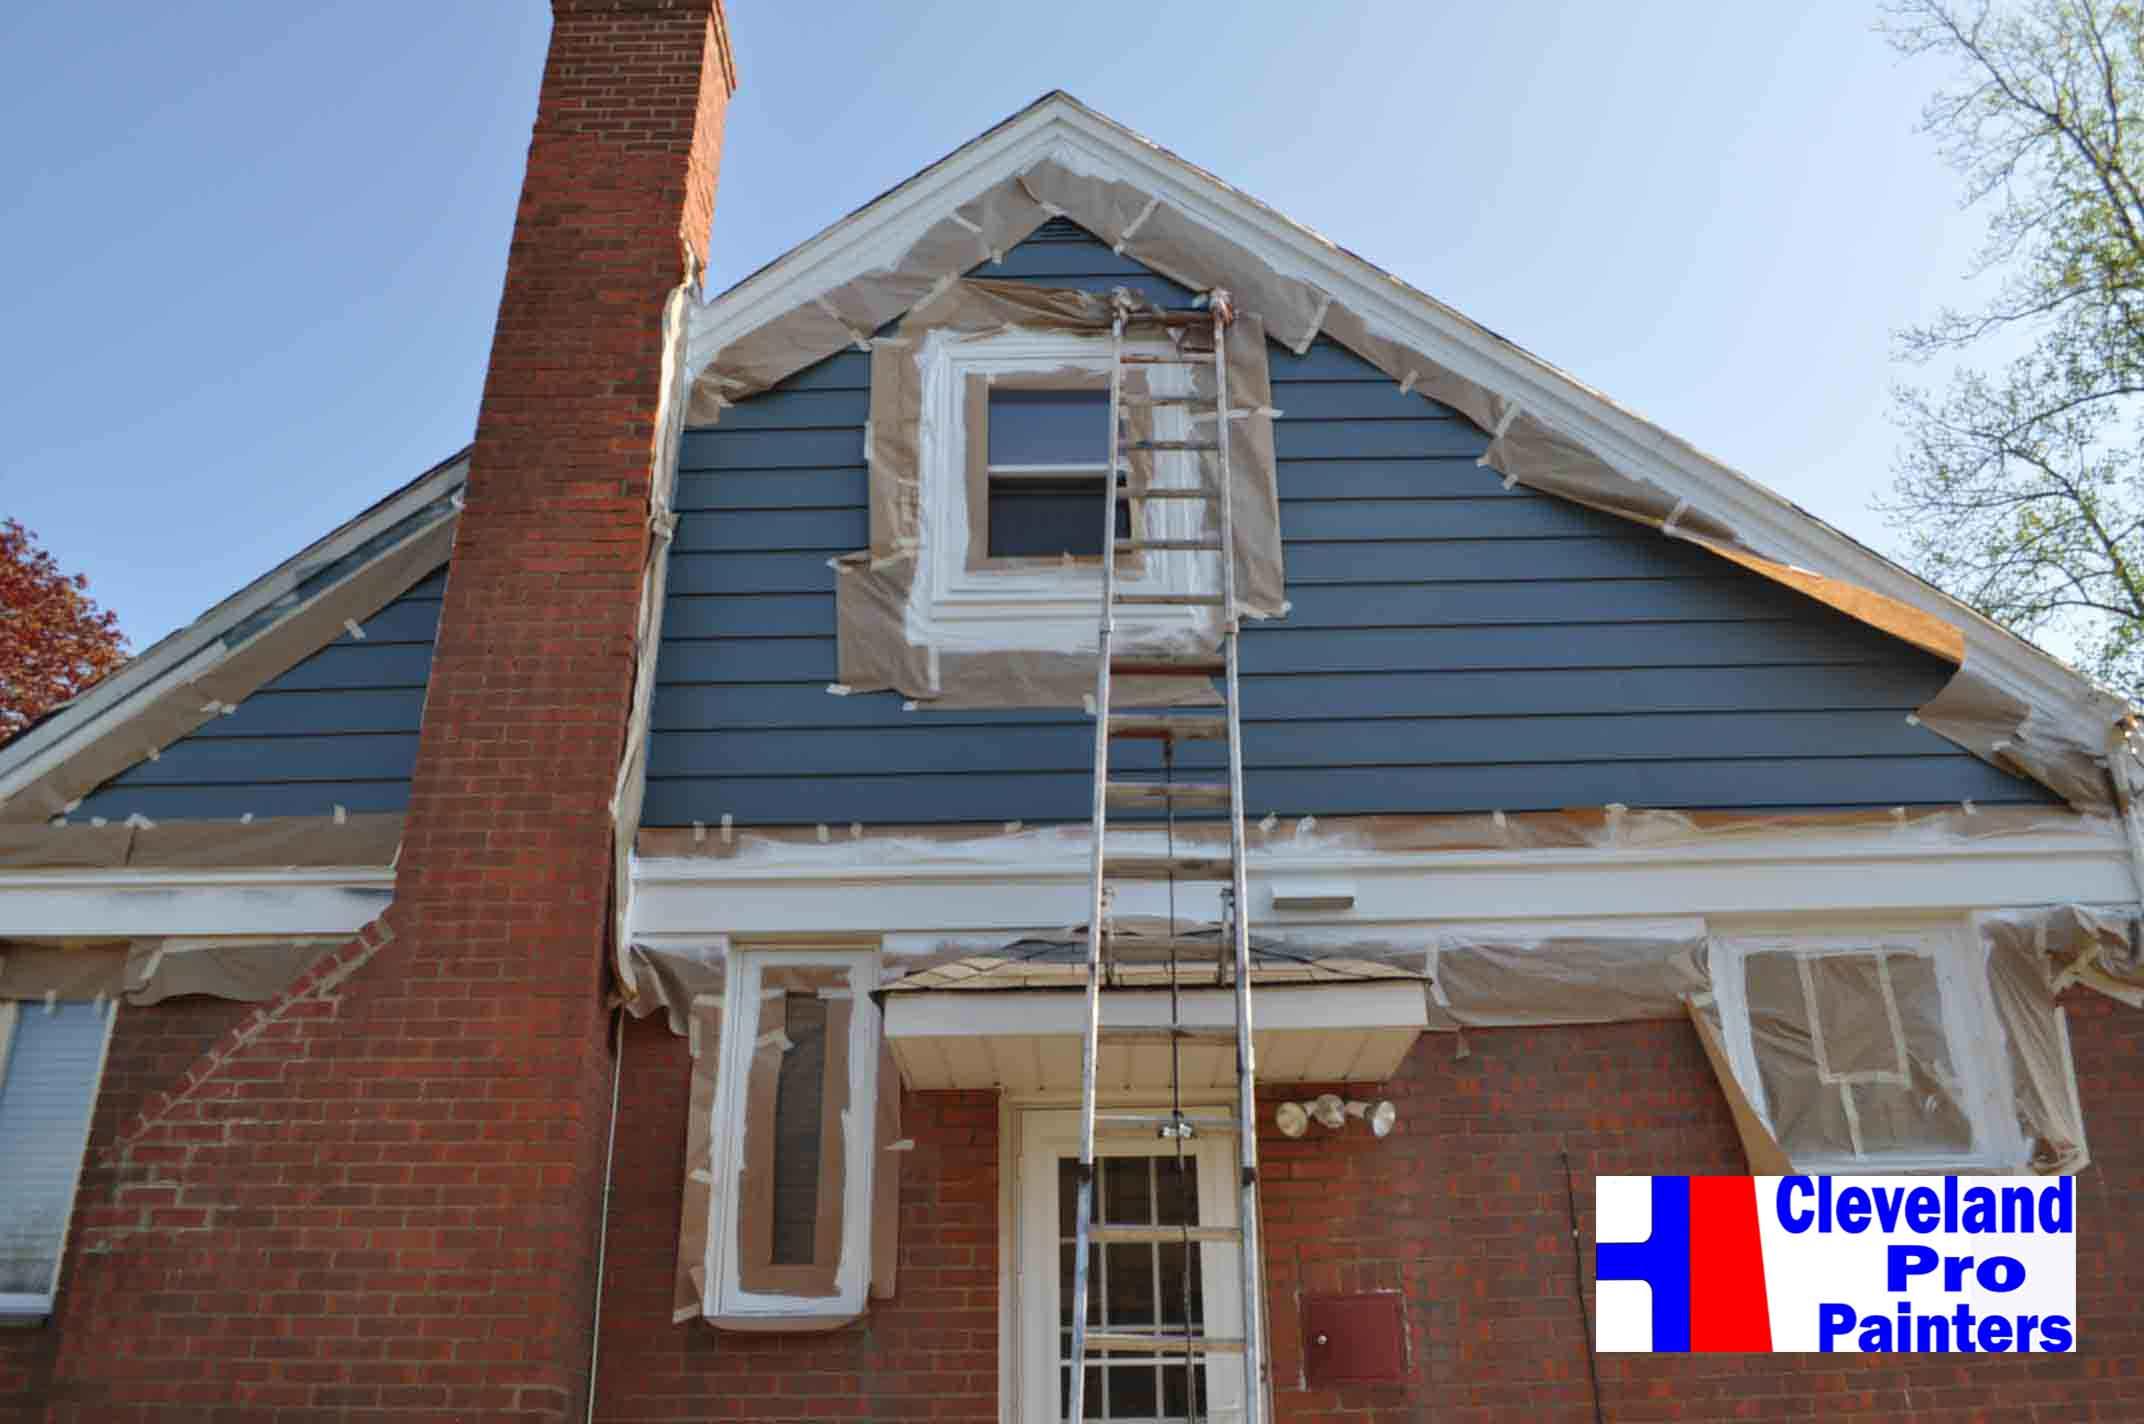 How to remove aluminum siding - New Siding From George J Keller Sons Llc Nj